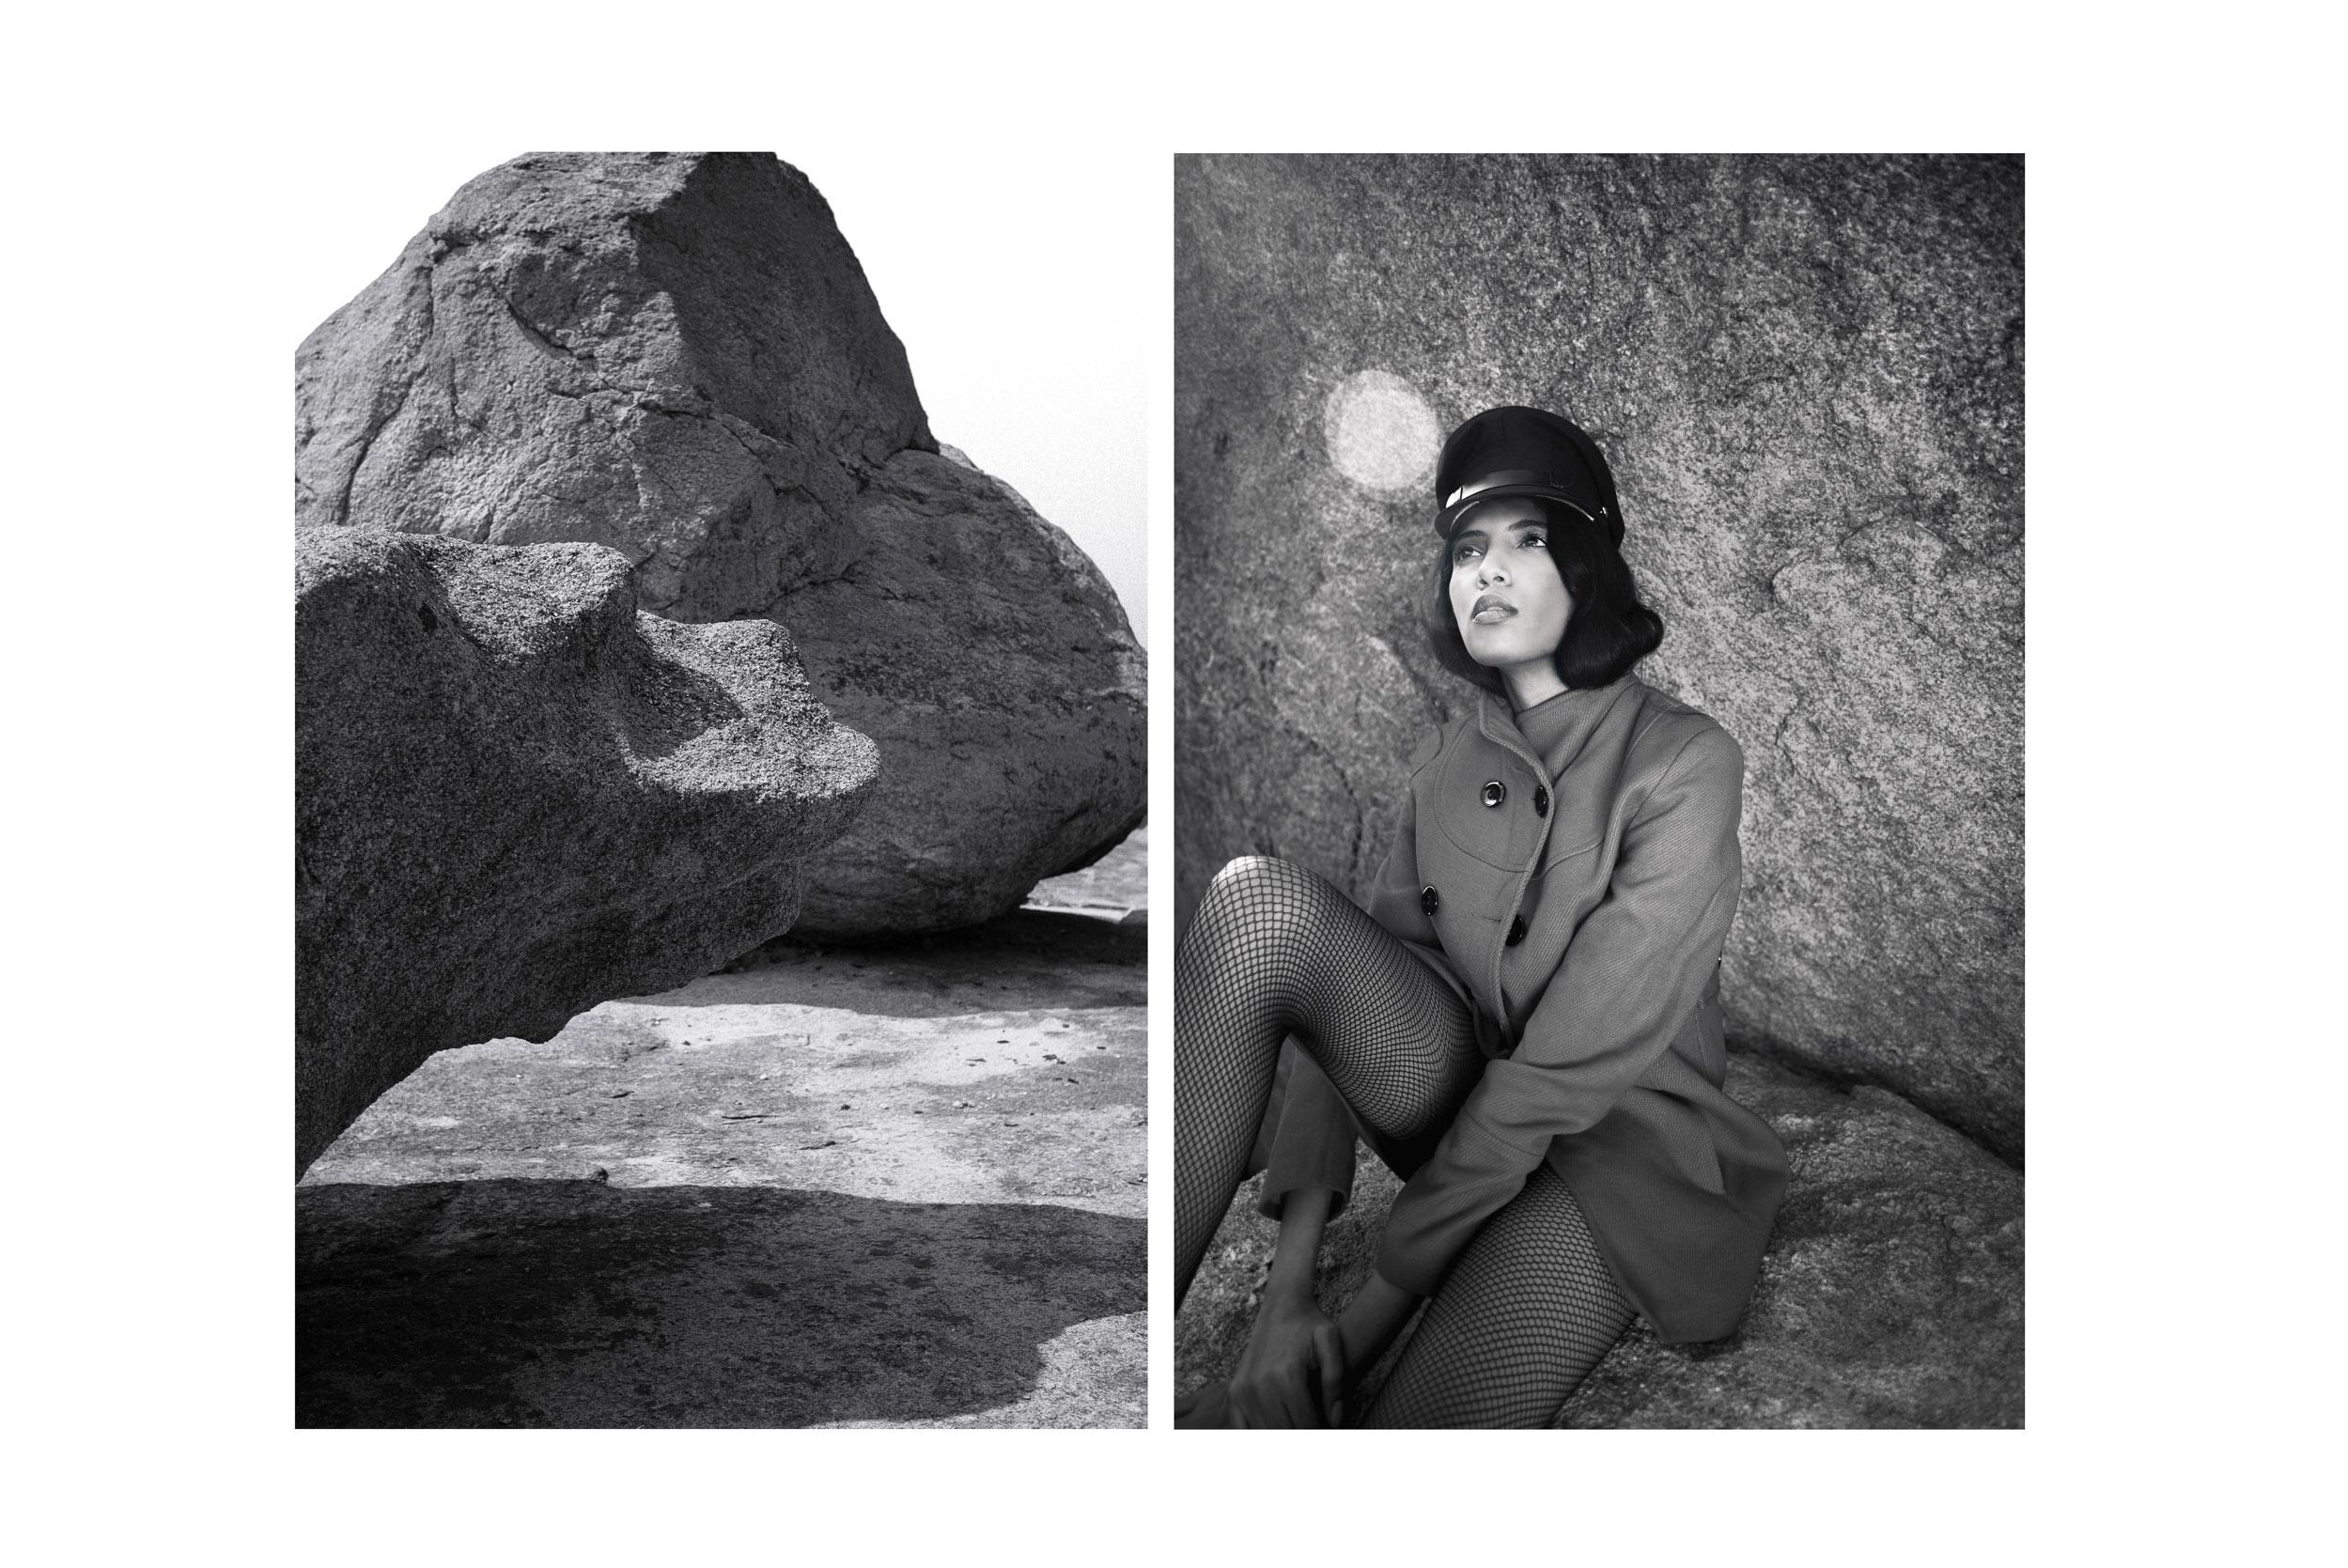 Sindhur_Photography_Fashion_Editorial 7.JPG